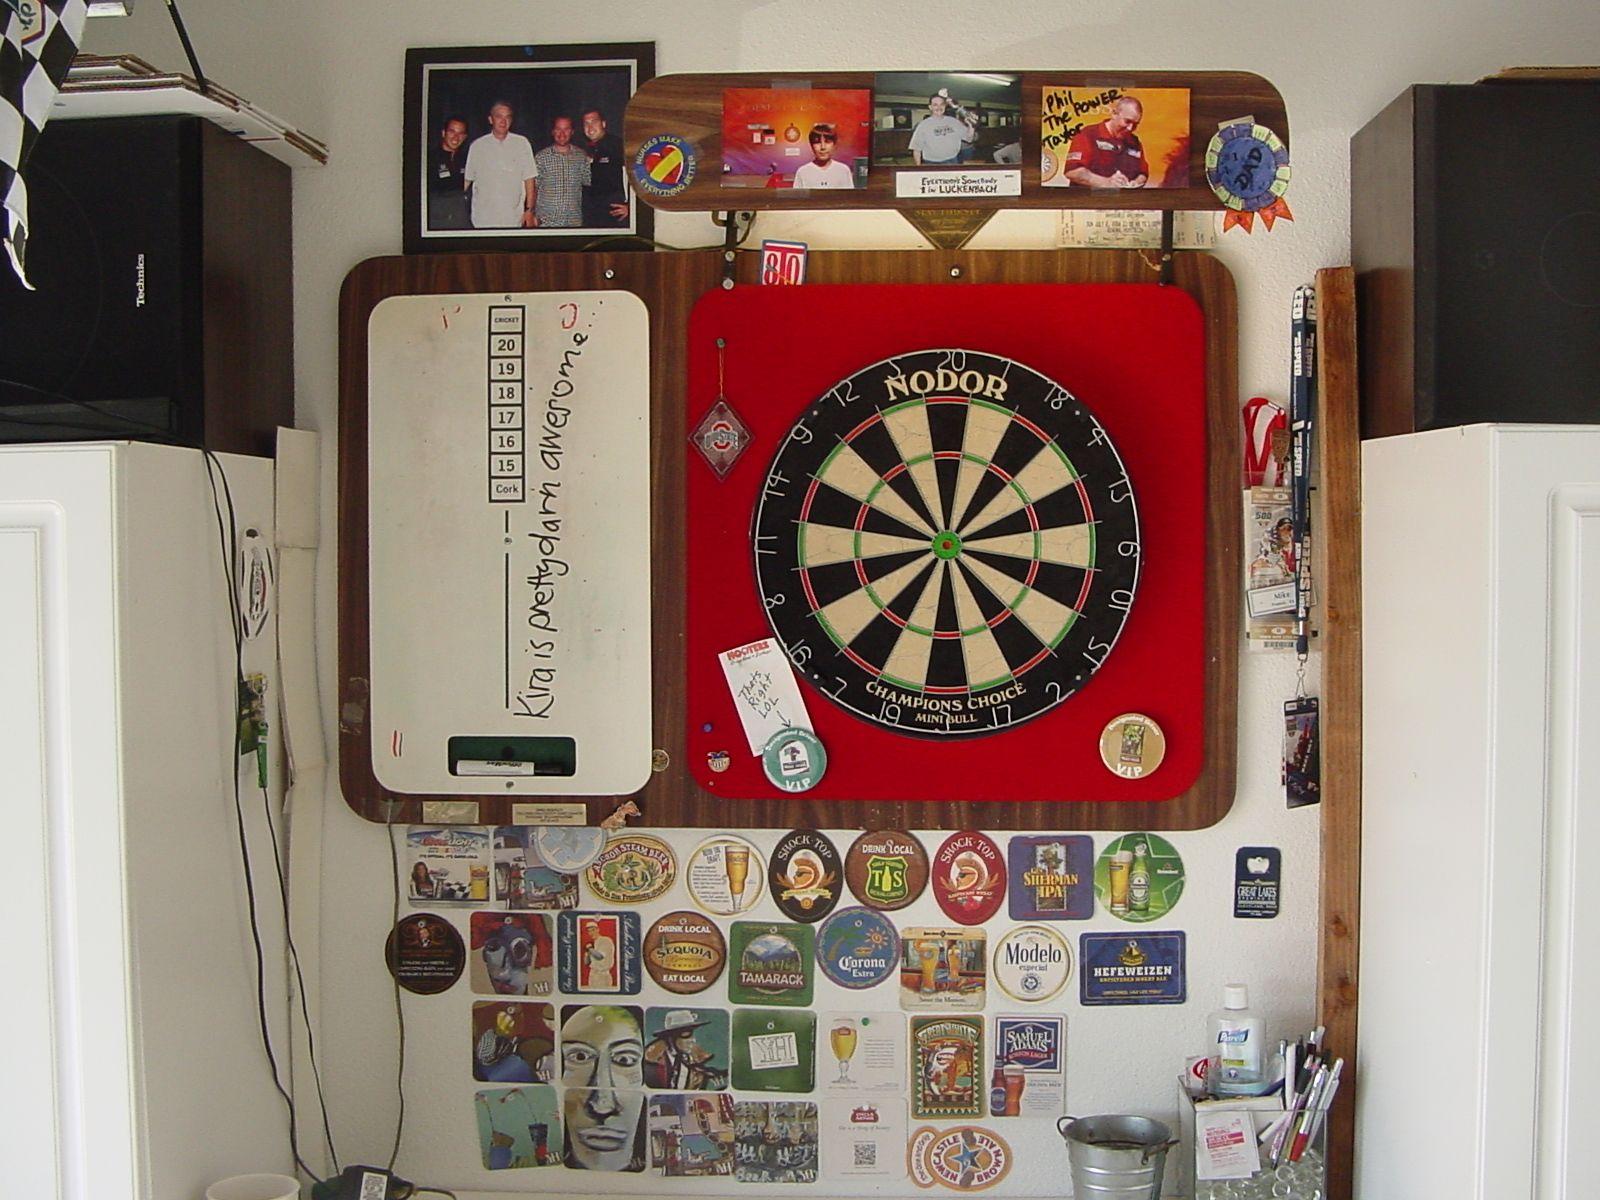 Pin by Colin m on Setups Dart board, Setup, Style